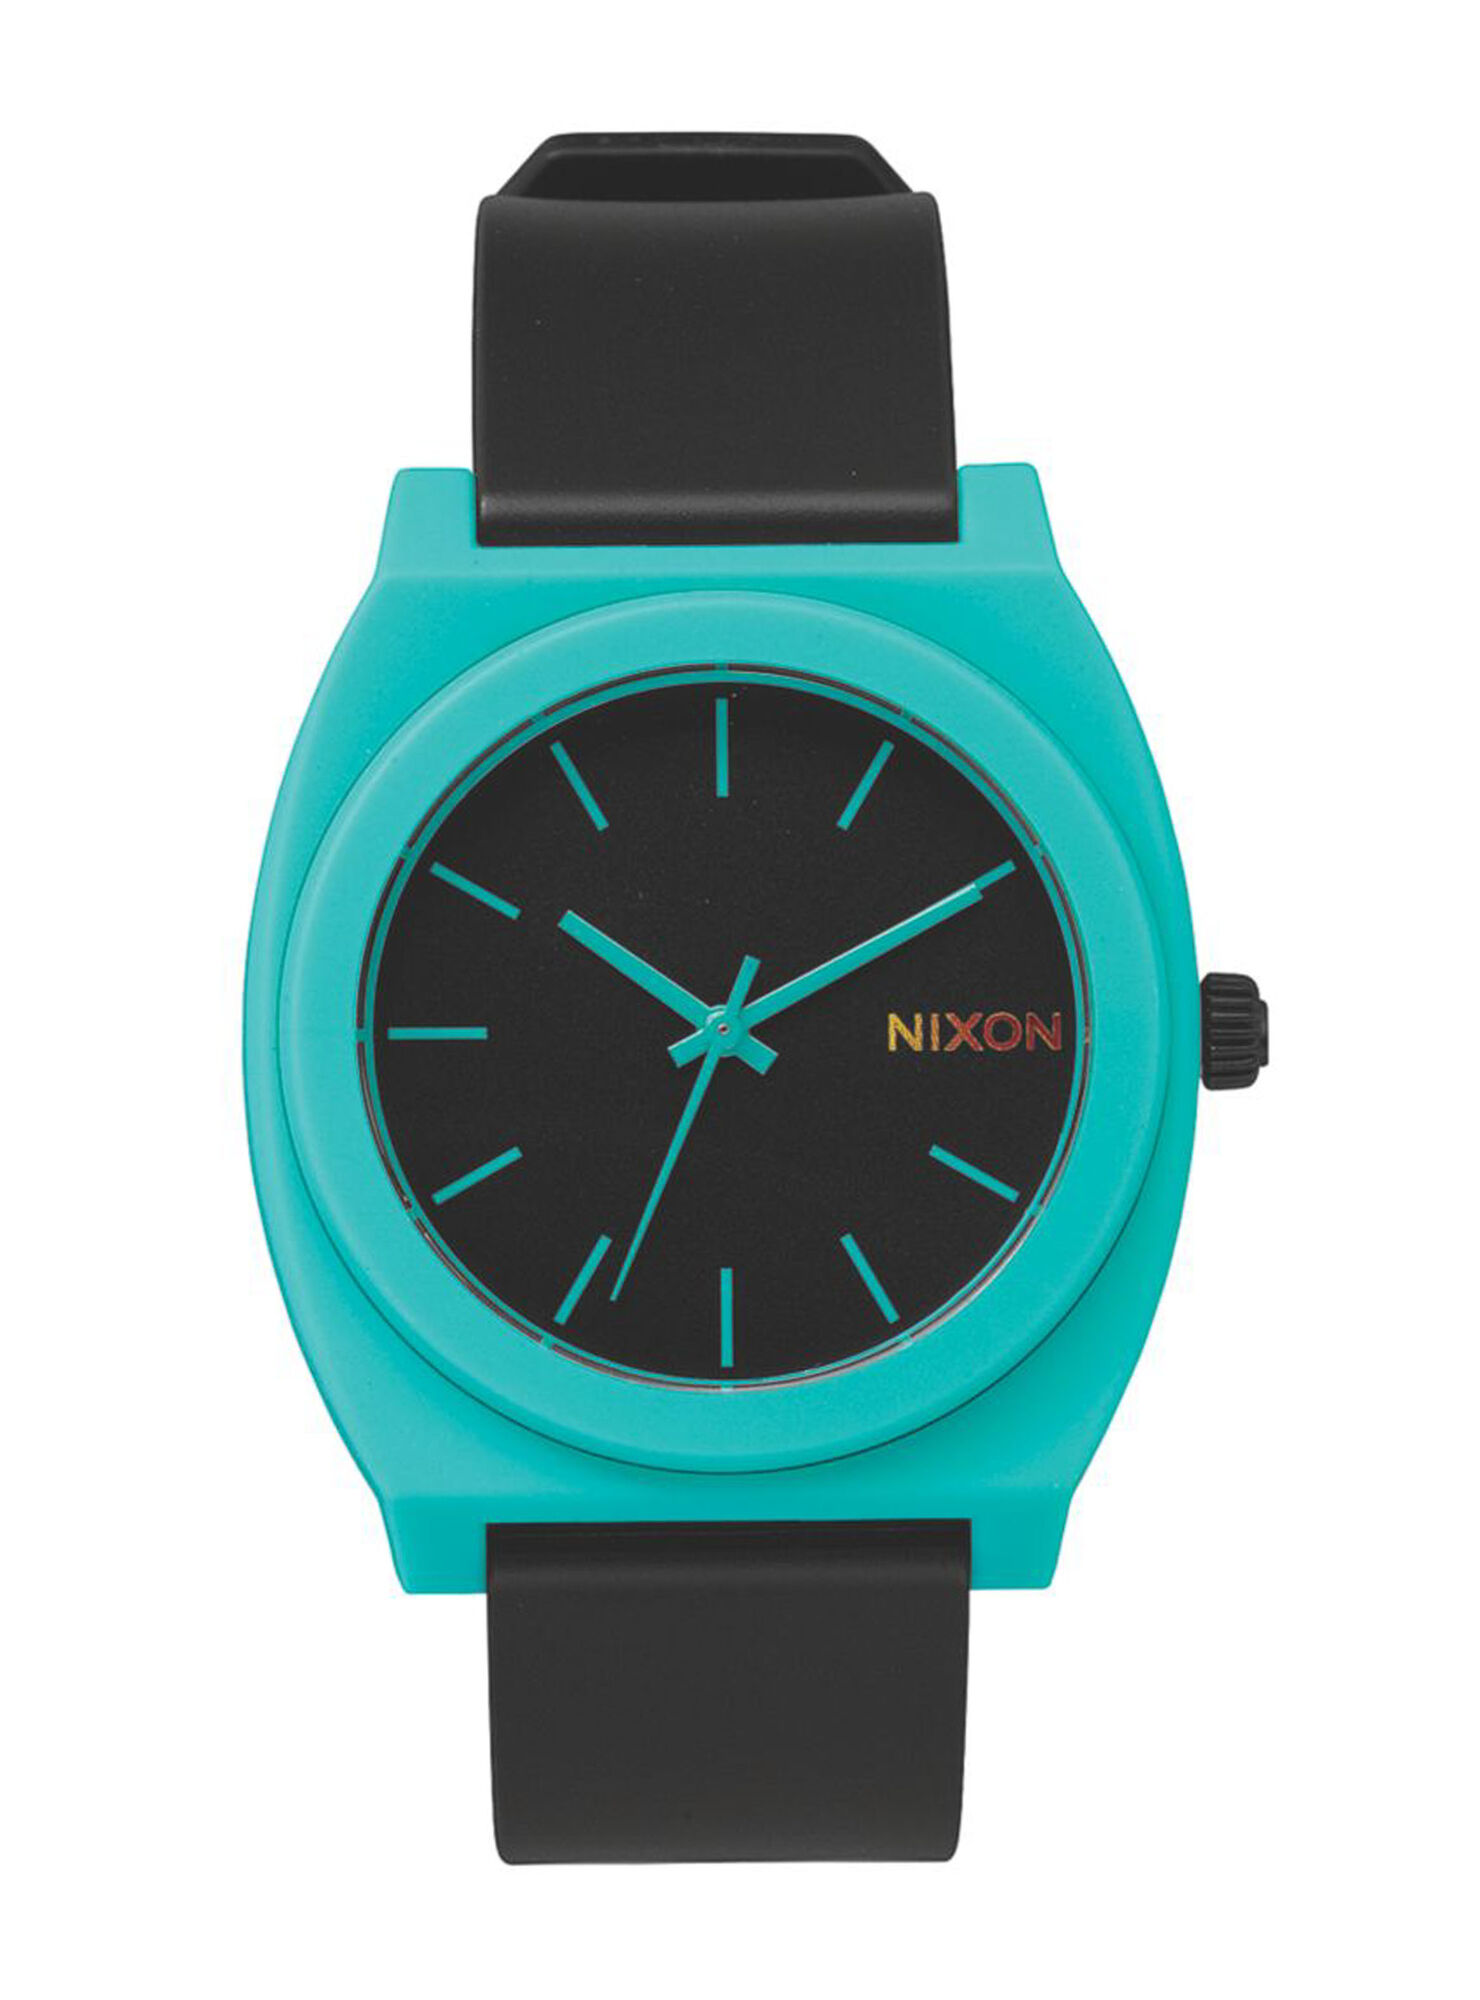 d62e1291cb94 Reloj Análogo Nixon Time Teller P Black Hombre en Relojes